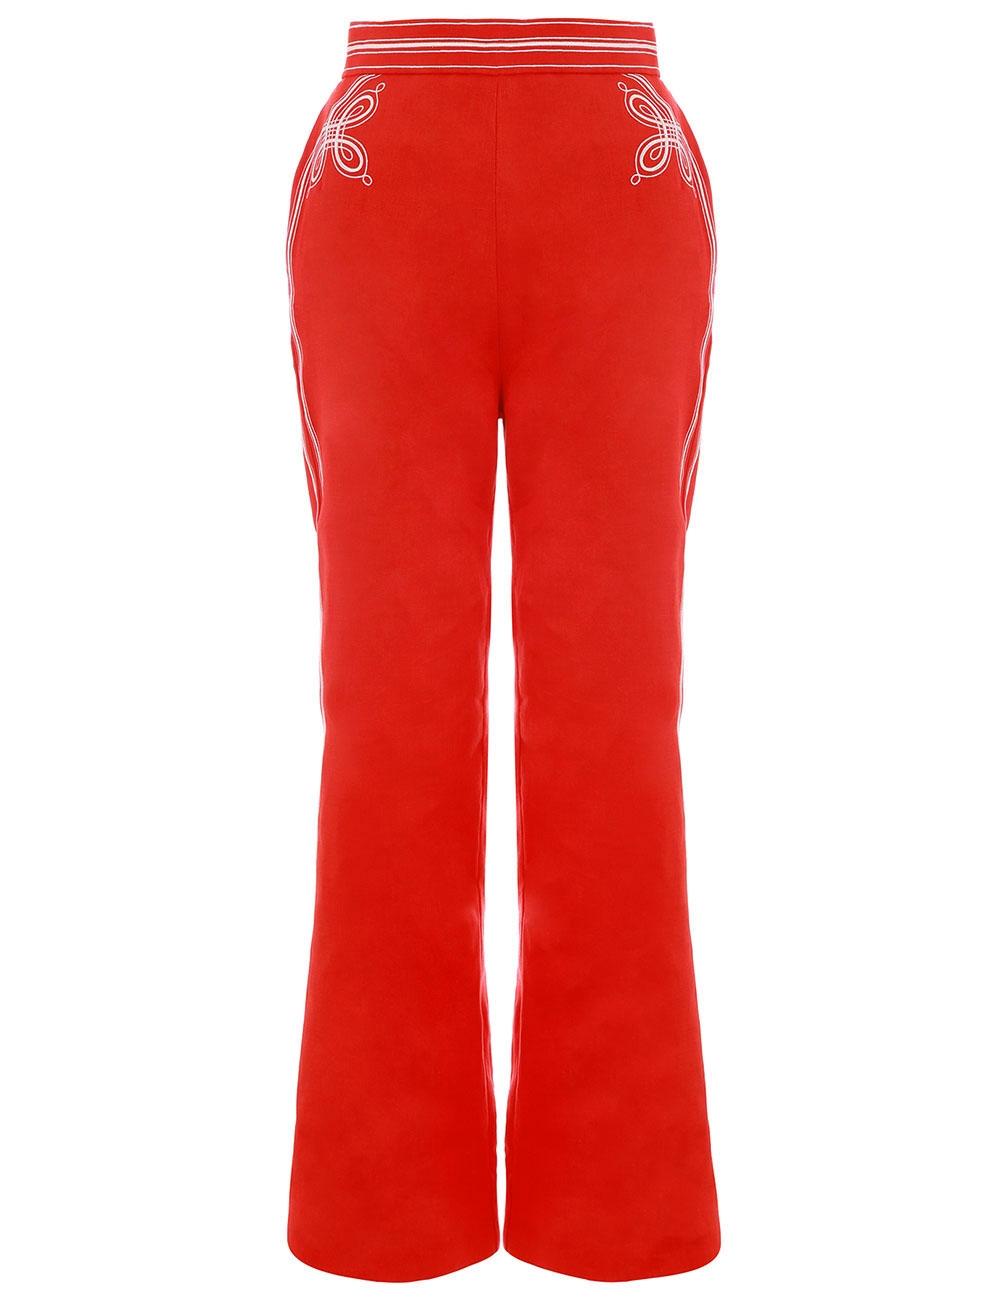 Ninety-Six Corded Pant